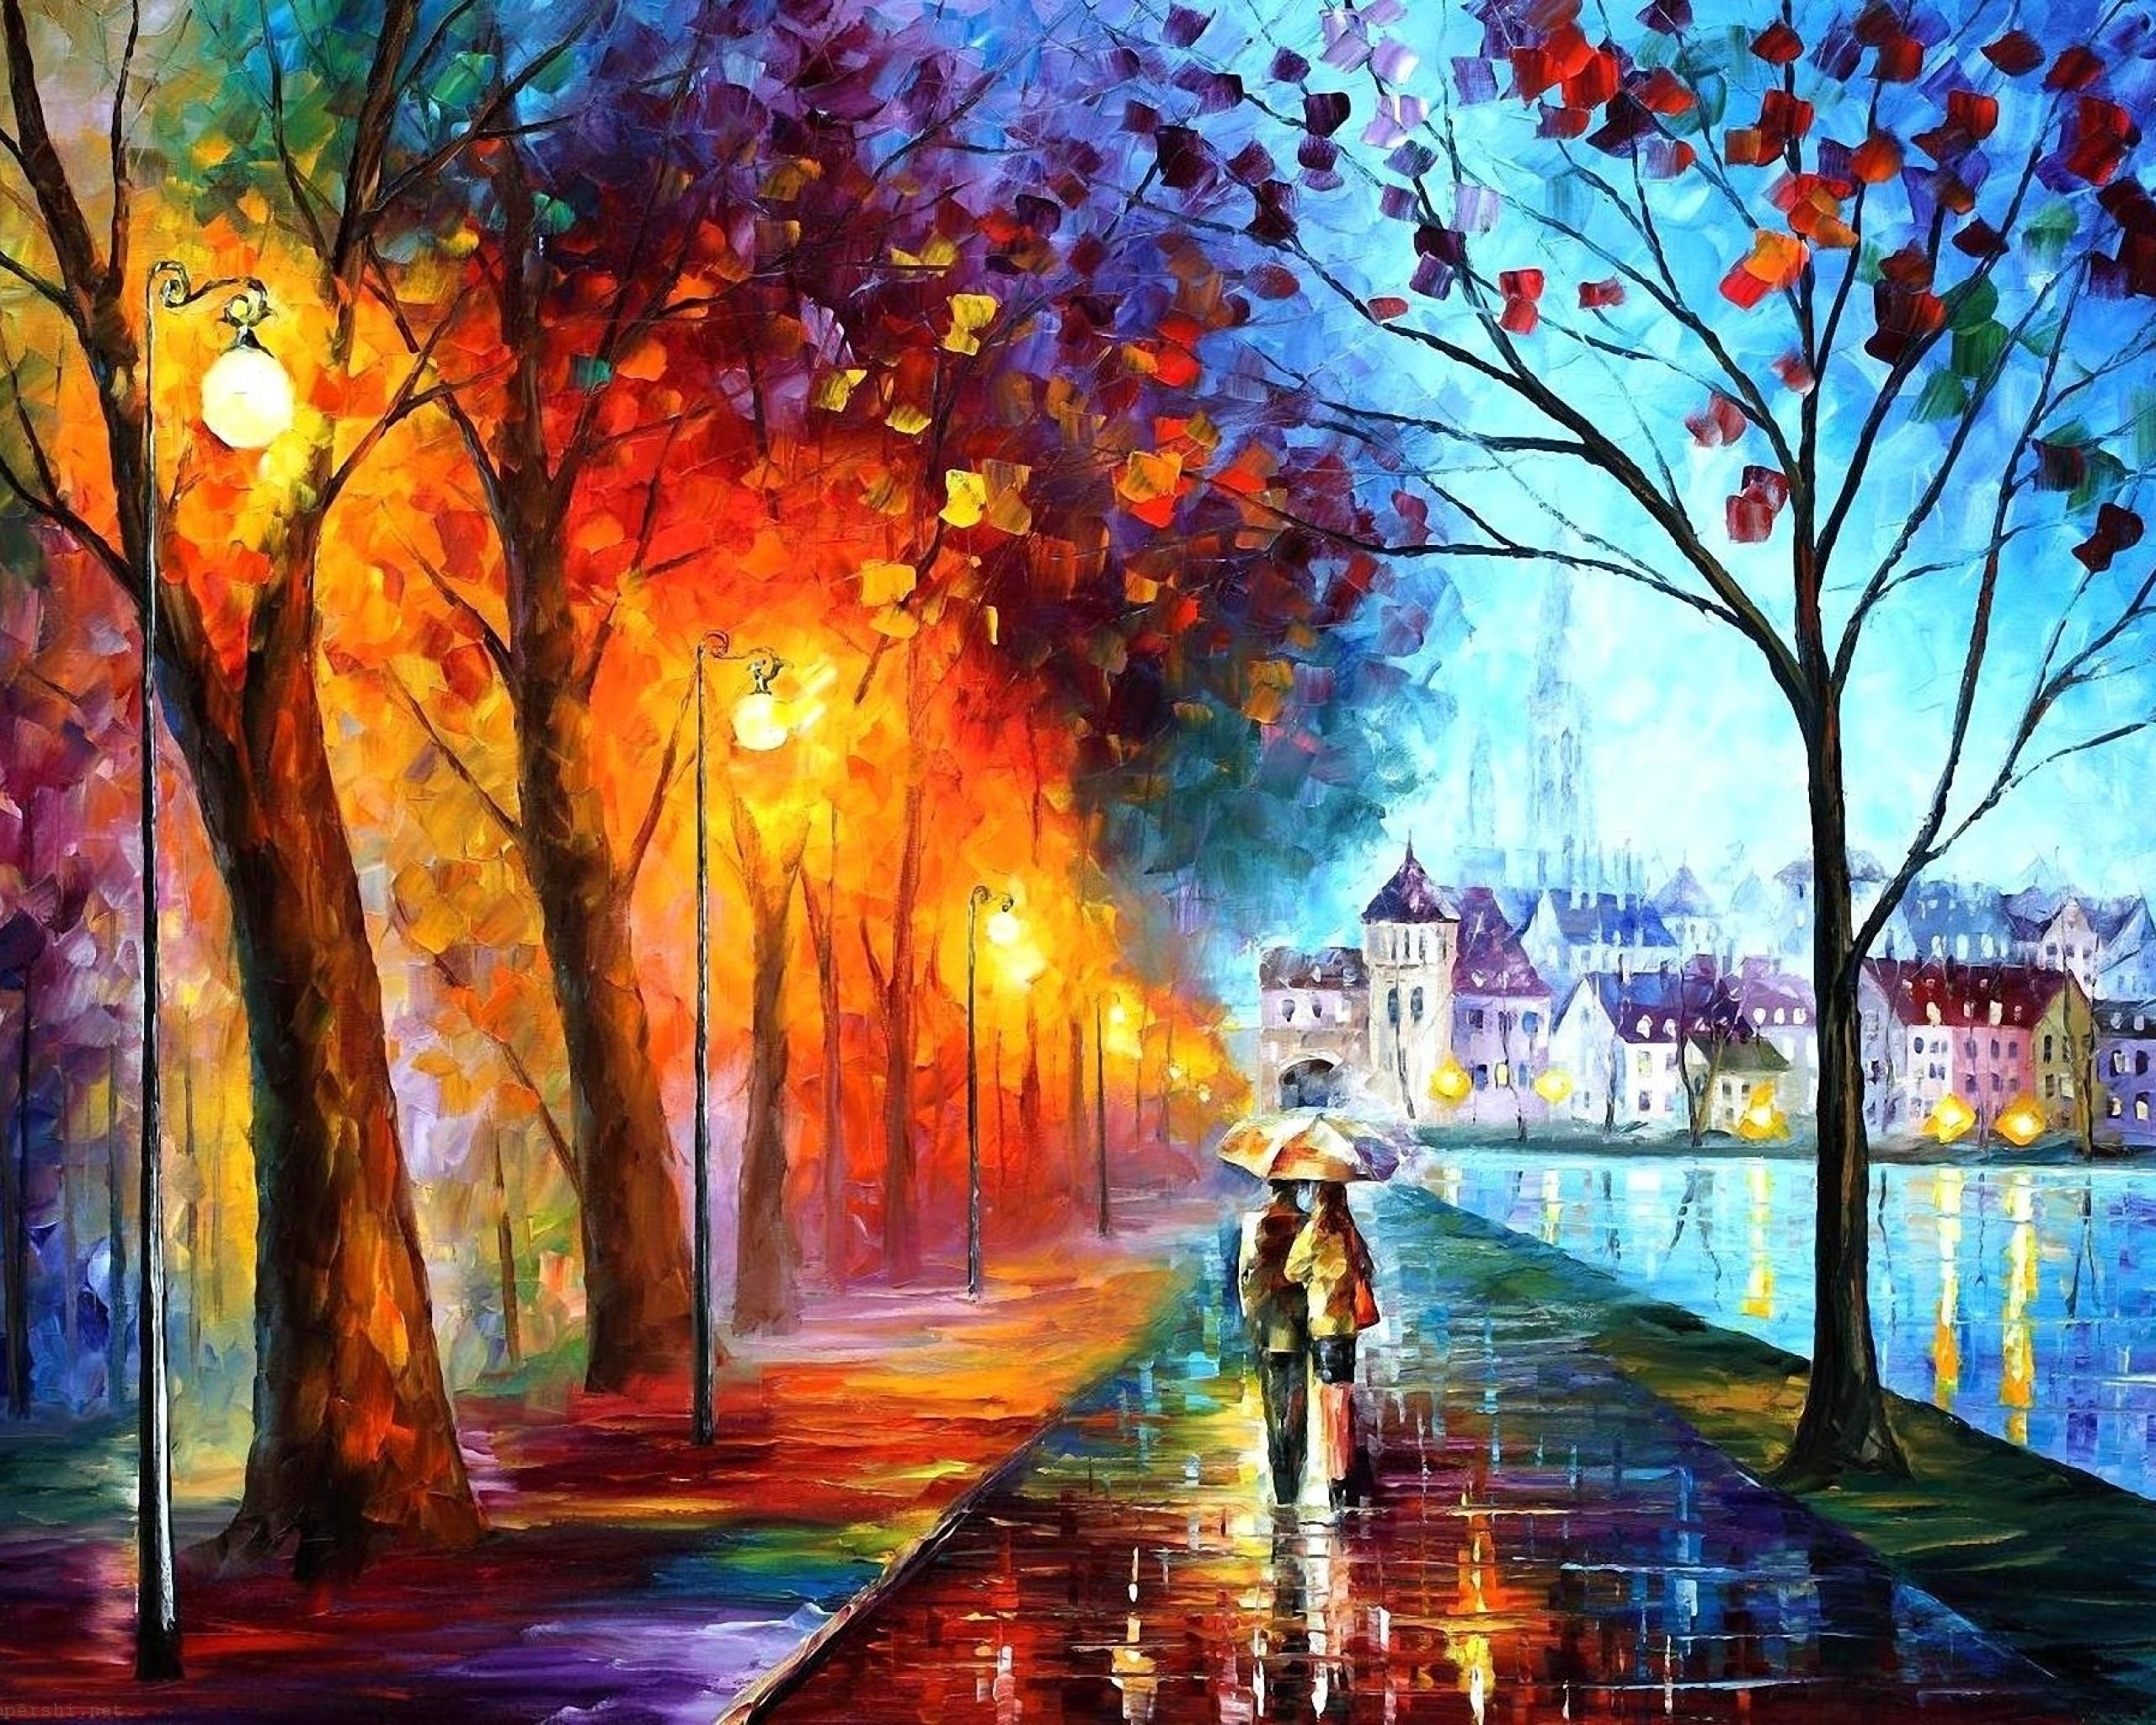 Drawn wallpaper widescreen Background walking Wallpaper 2560x2048 HD